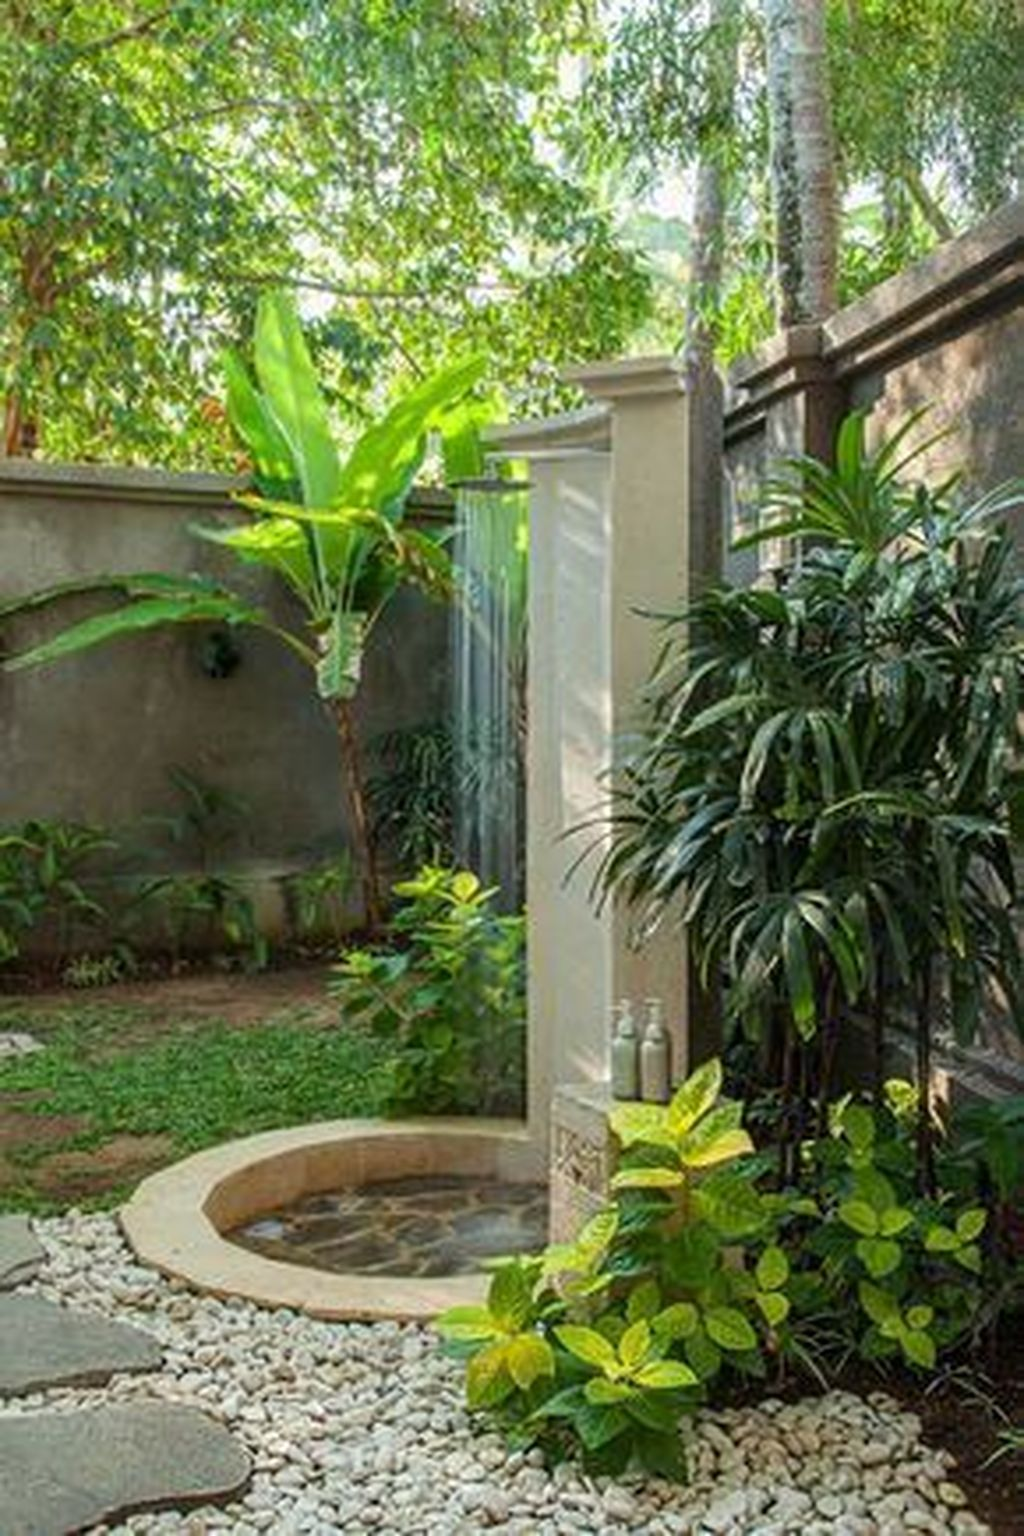 Creative Outdoor Bathroom Design Ideas For Enjoying Summer 13